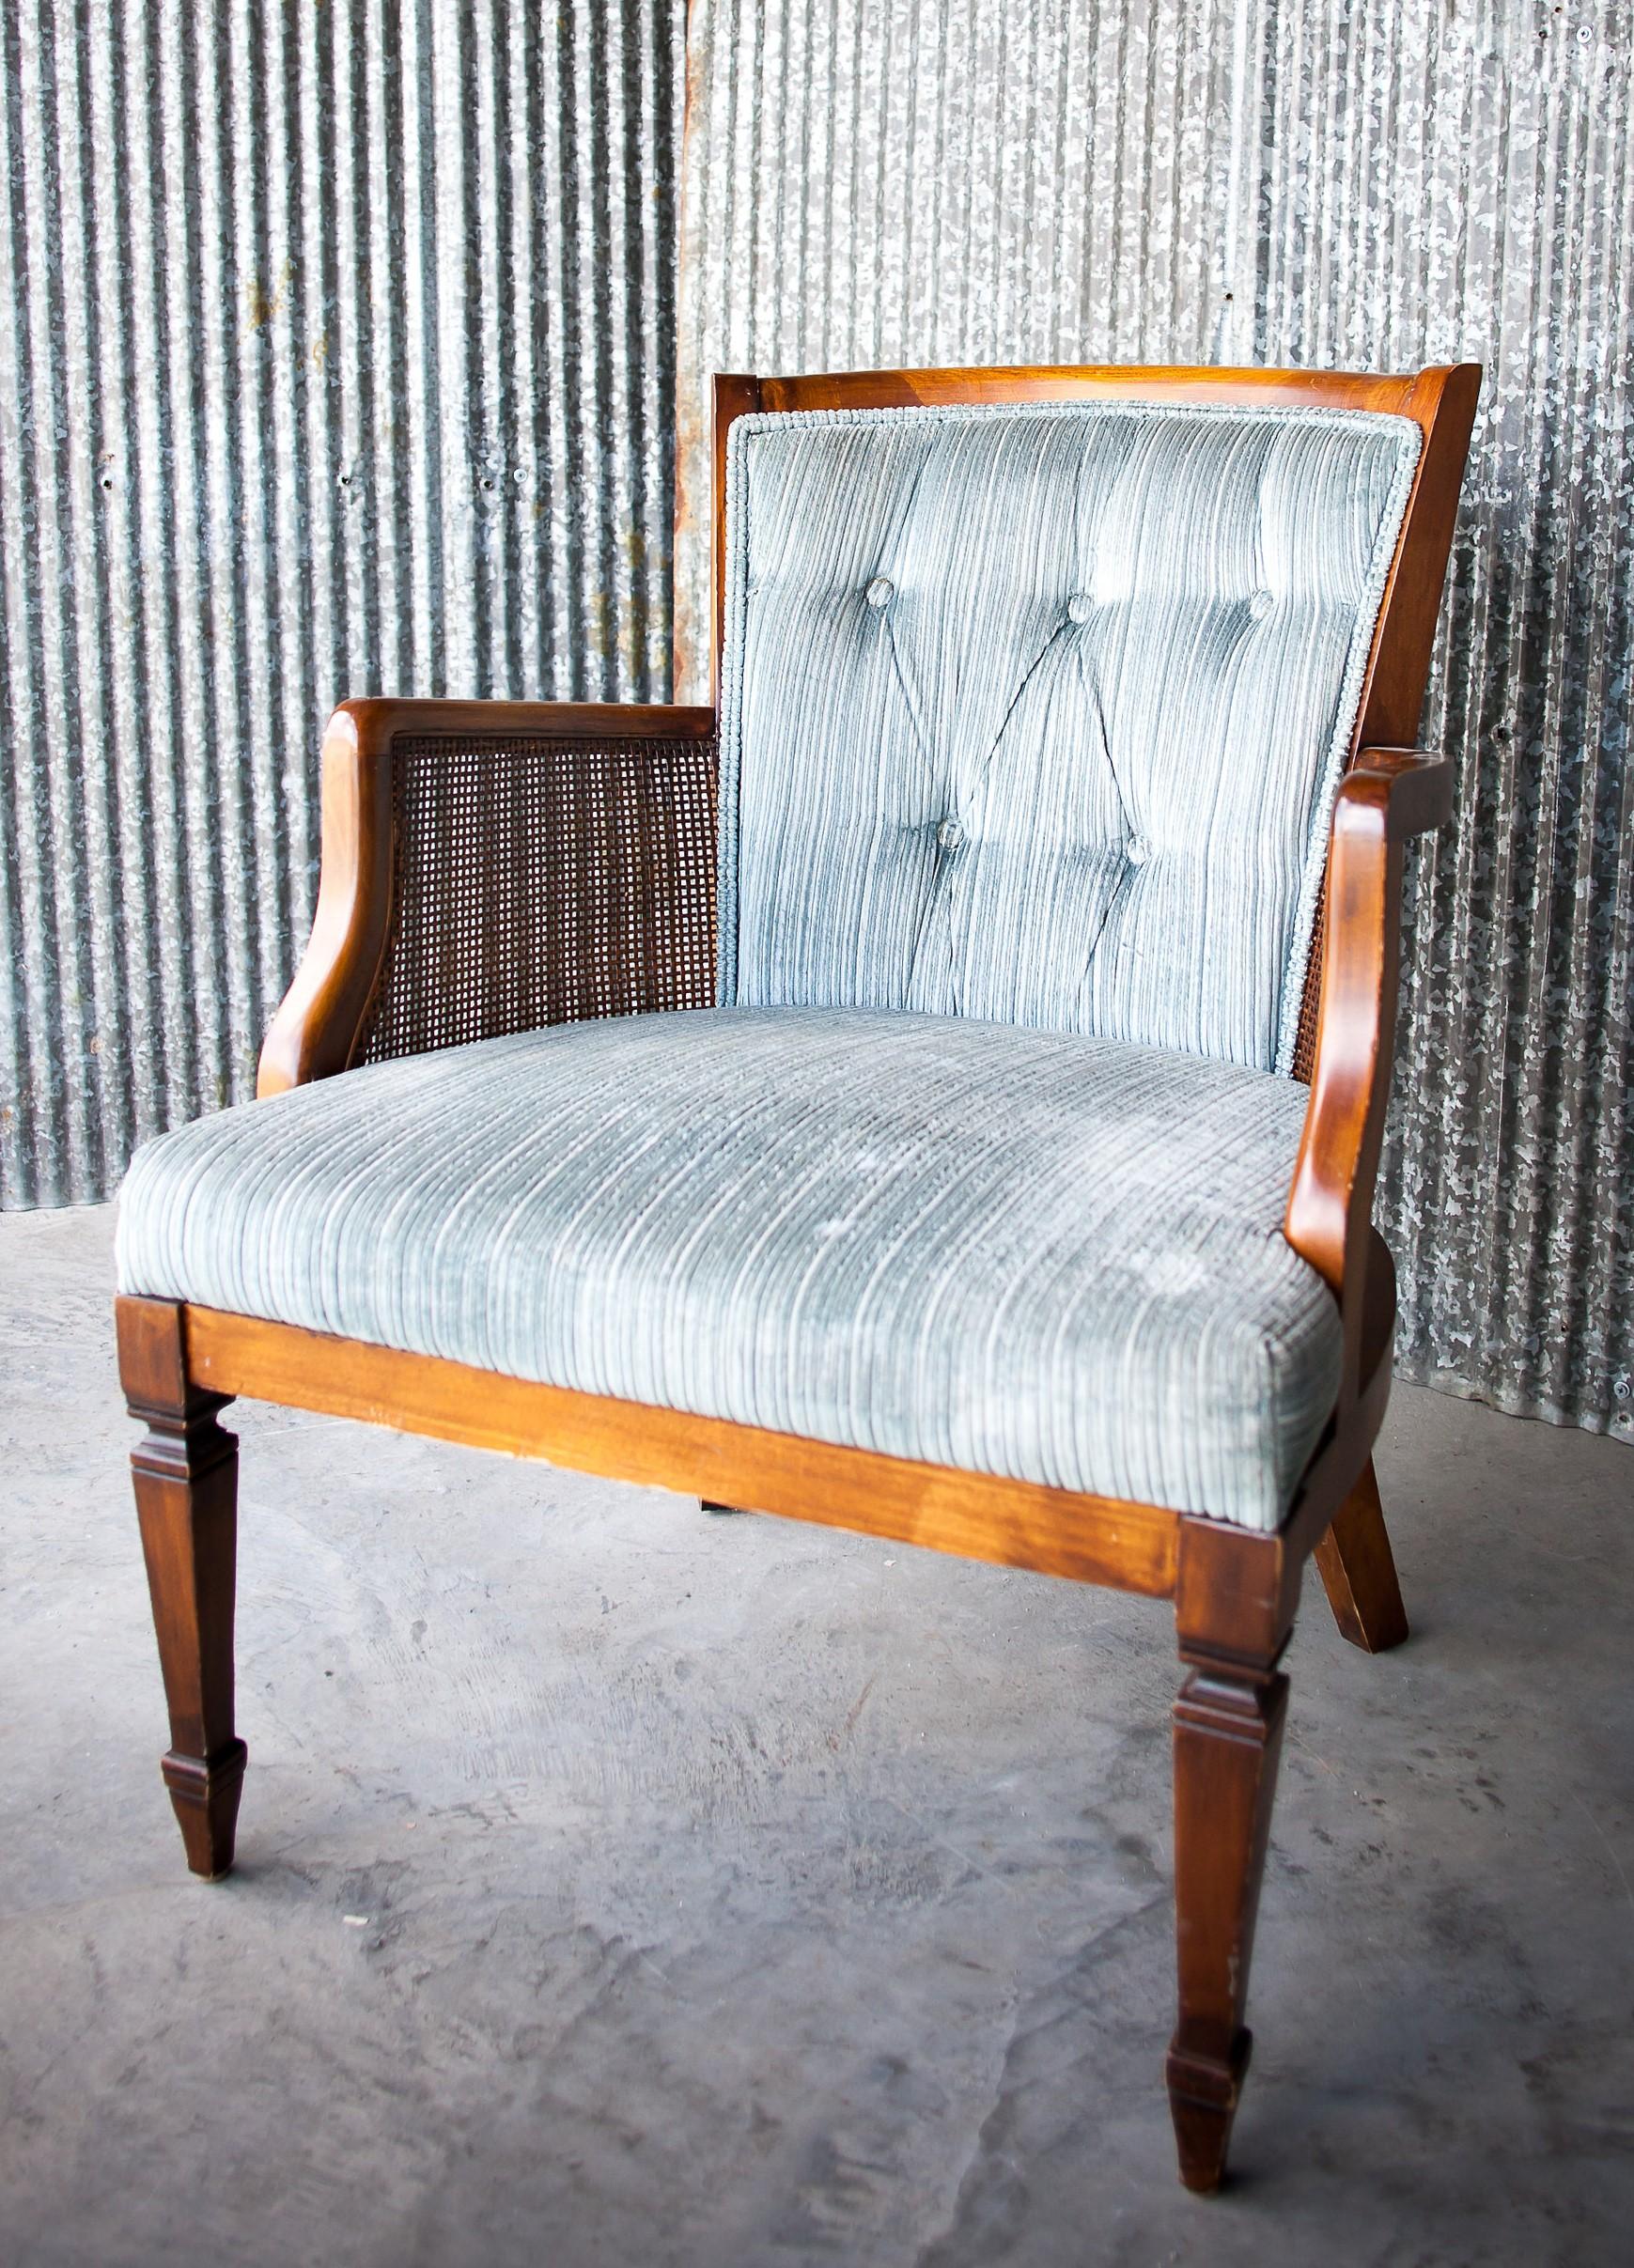 Serenity Blue / Blog Post - Something Old Event Rentals Presley Chair Vintage Rentals